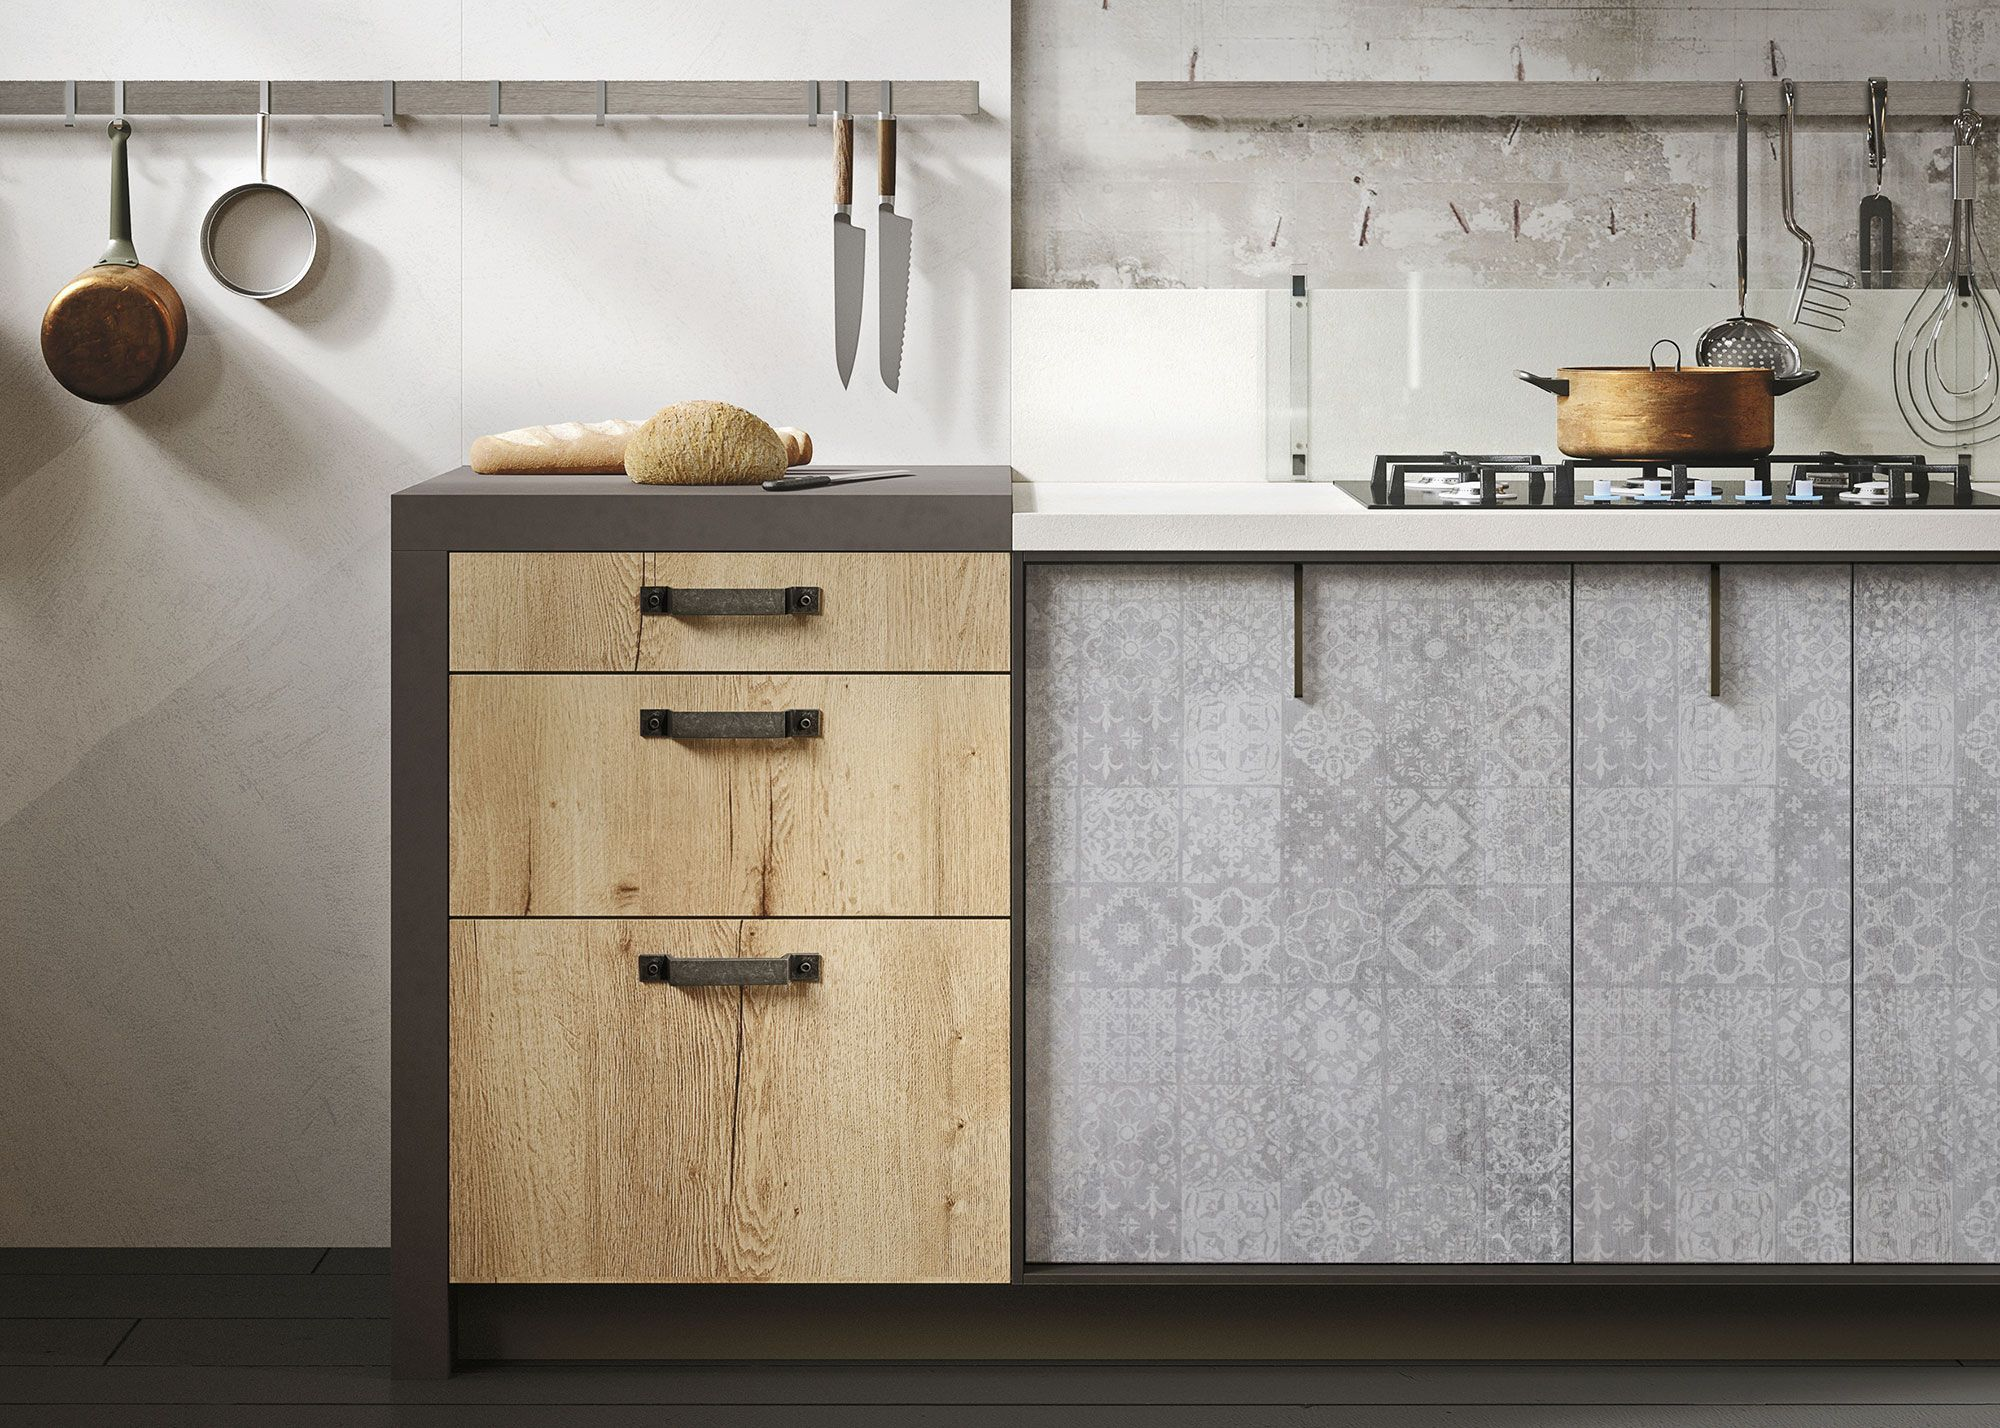 Snaidero Loft Kitchen 6 Urban Industrial Decor Industrial Decor Industrial Apartment Decor